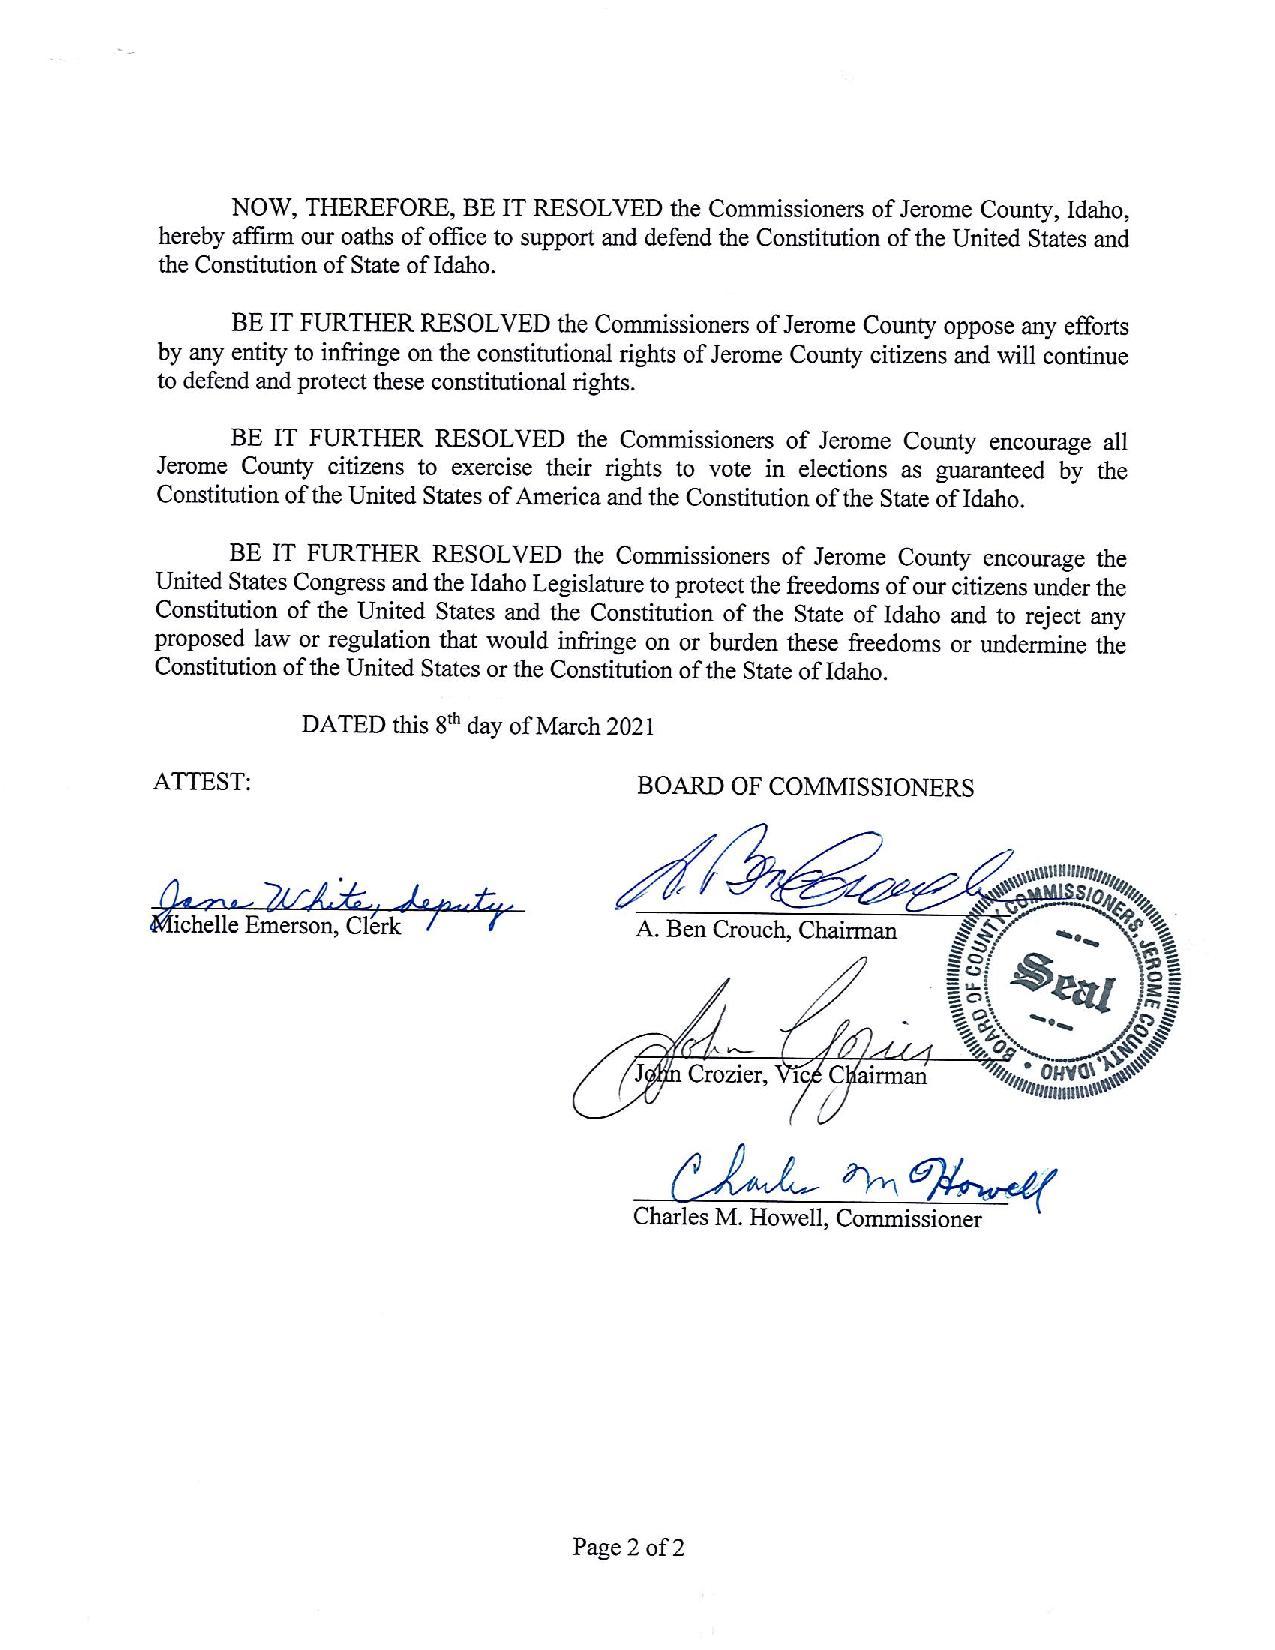 Jerome County Idaho Resolution Page 2